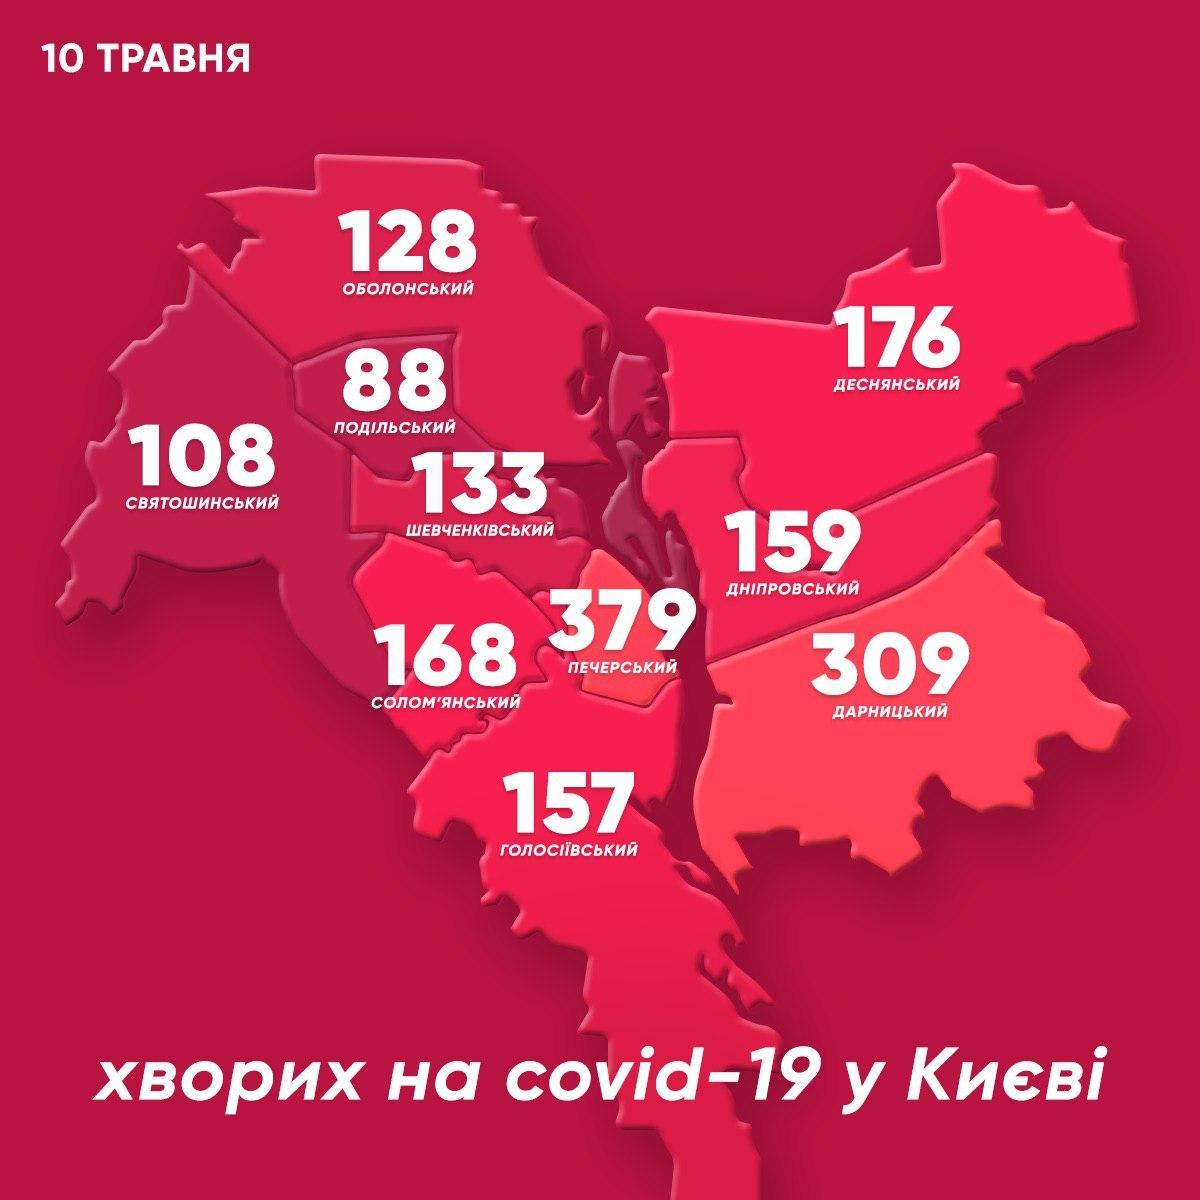 Коронавирус в Киеве - статистика и карта на 10 мая / телеграм-канал Виталия Кличко